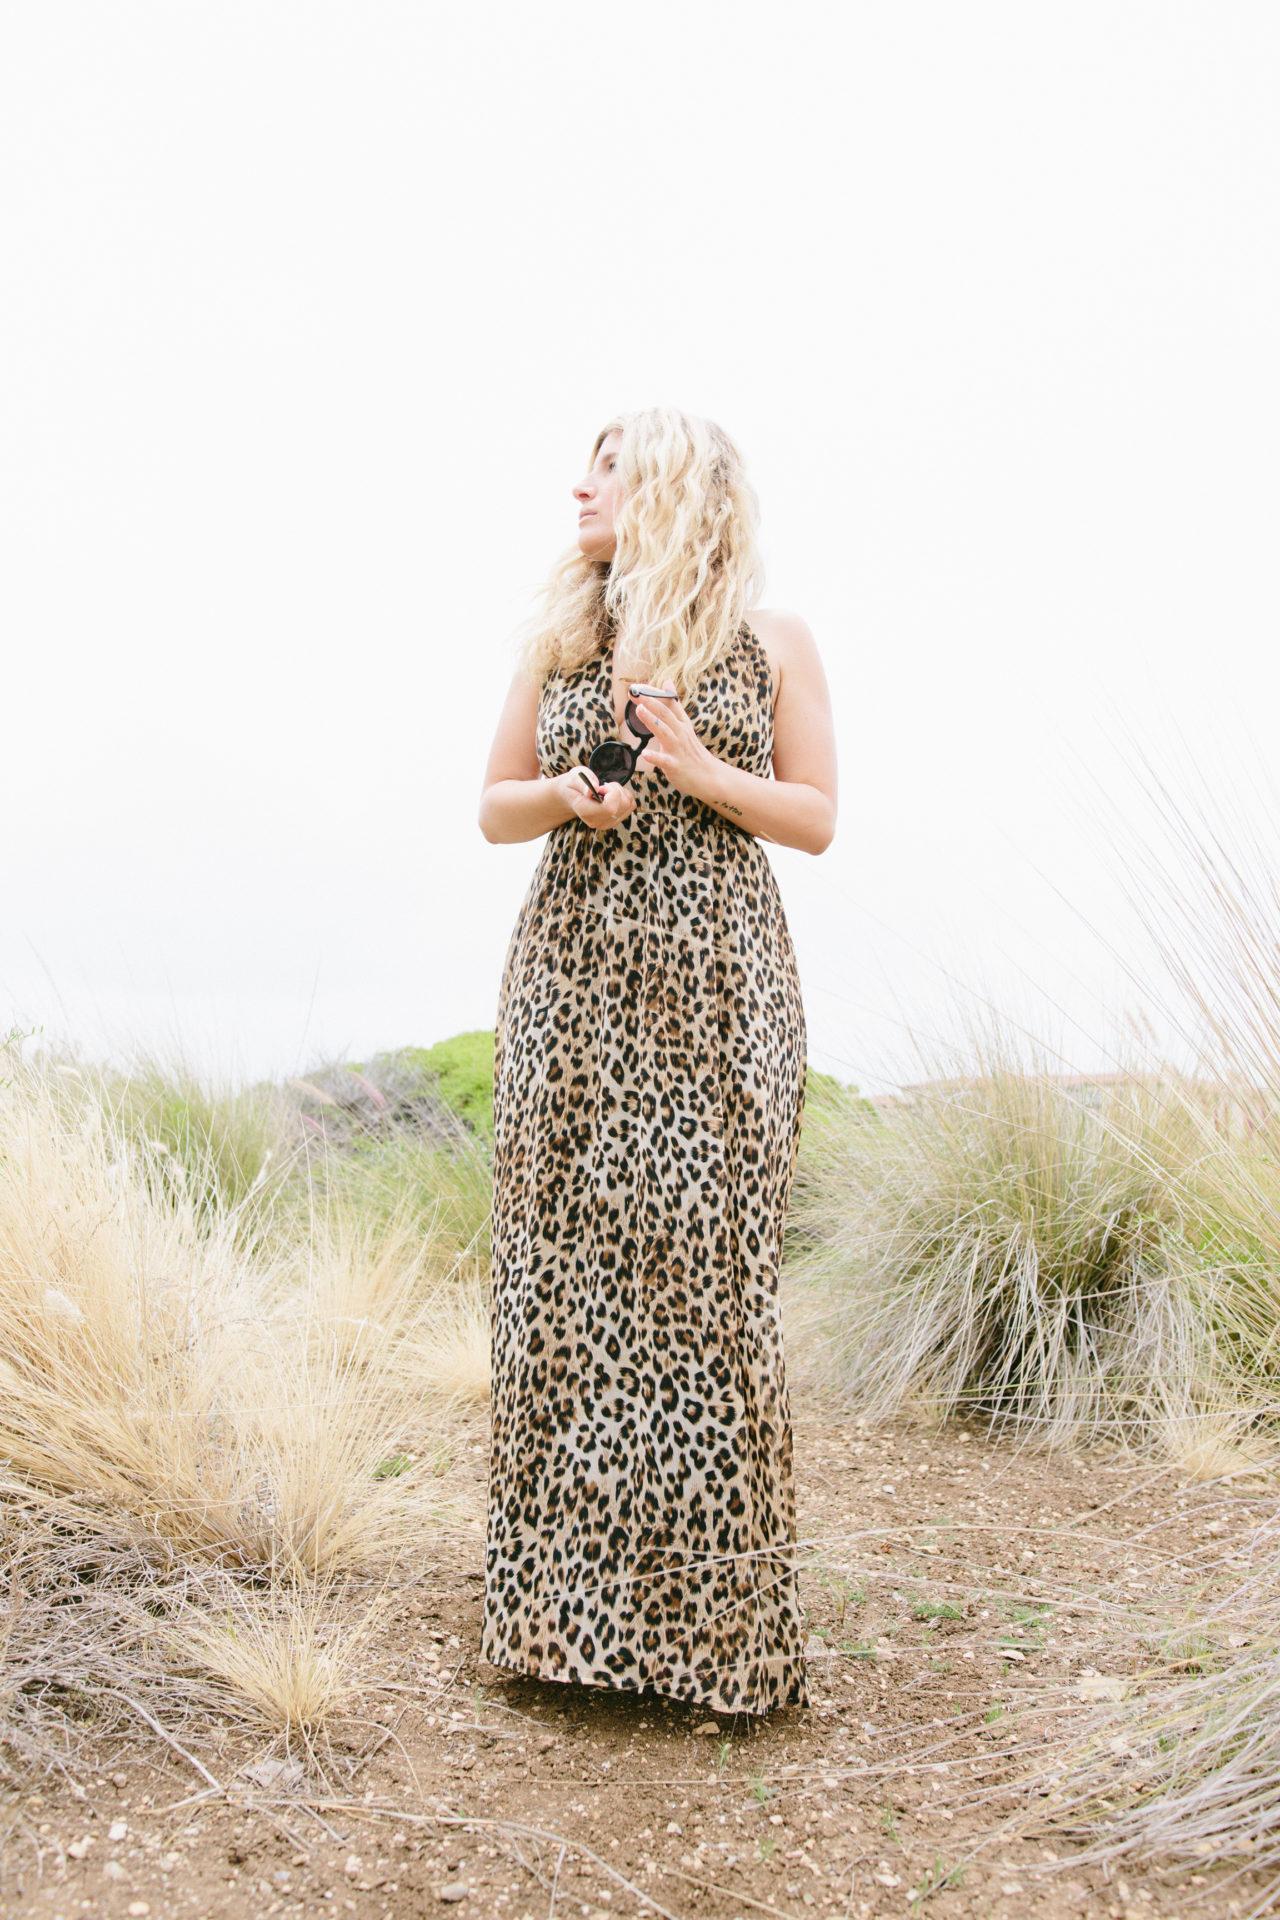 MrKate_OOTD_leopard (36 of 57)